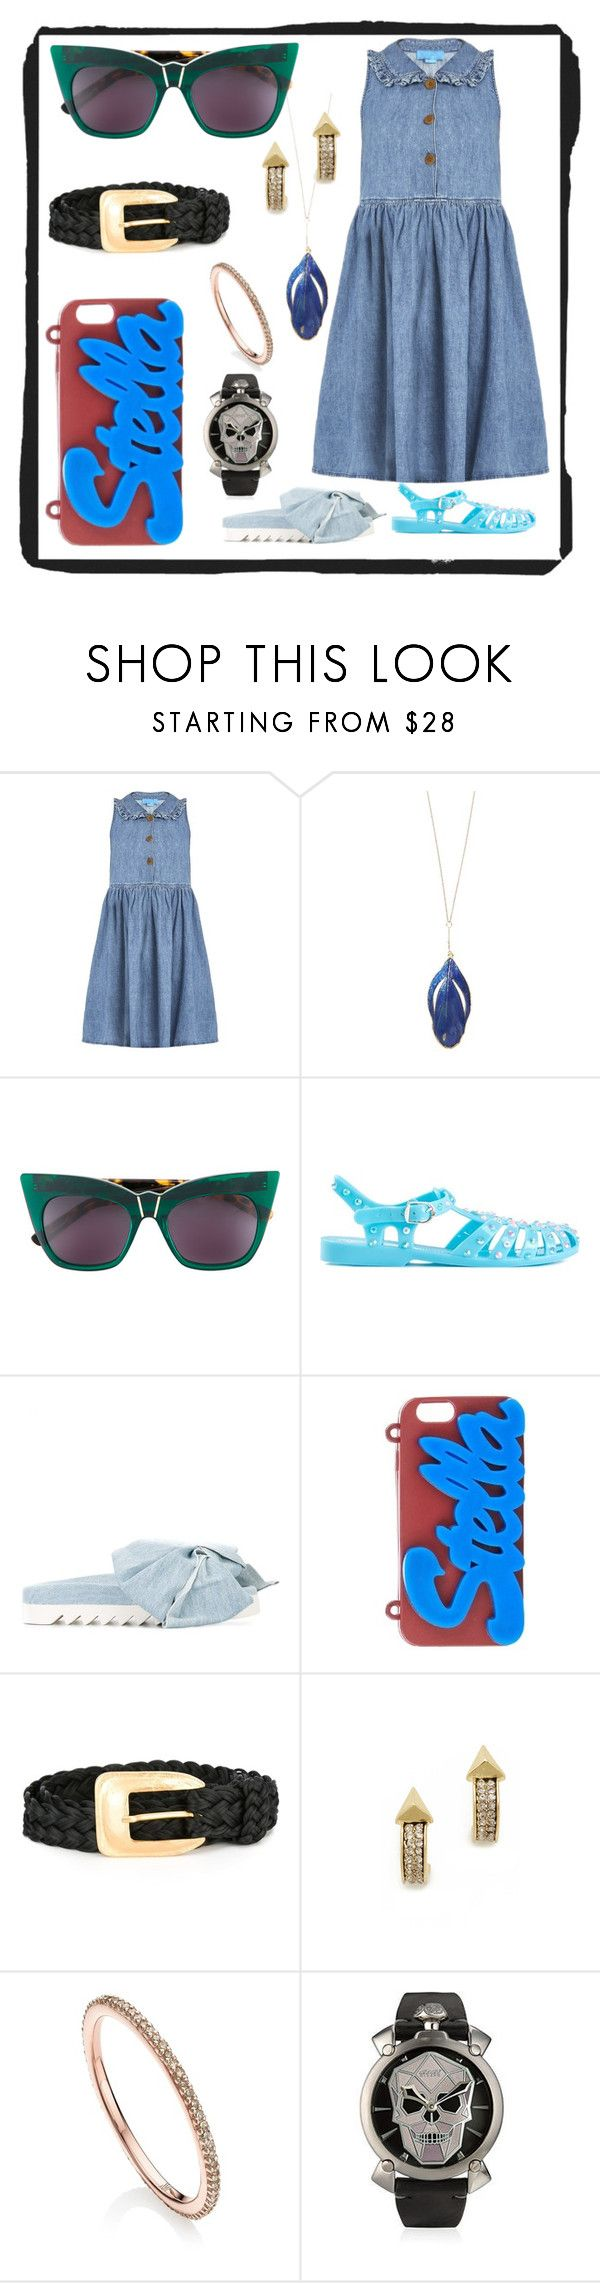 """Jeans Sun Dress..."" by ramakumari ❤ liked on Polyvore featuring M.i.h Jeans, Aurélie Bidermann, Pared, Markus Lupfer, Joshua's, STELLA McCARTNEY, Yves Saint Laurent, House of Harlow 1960 and Monica Vinader"